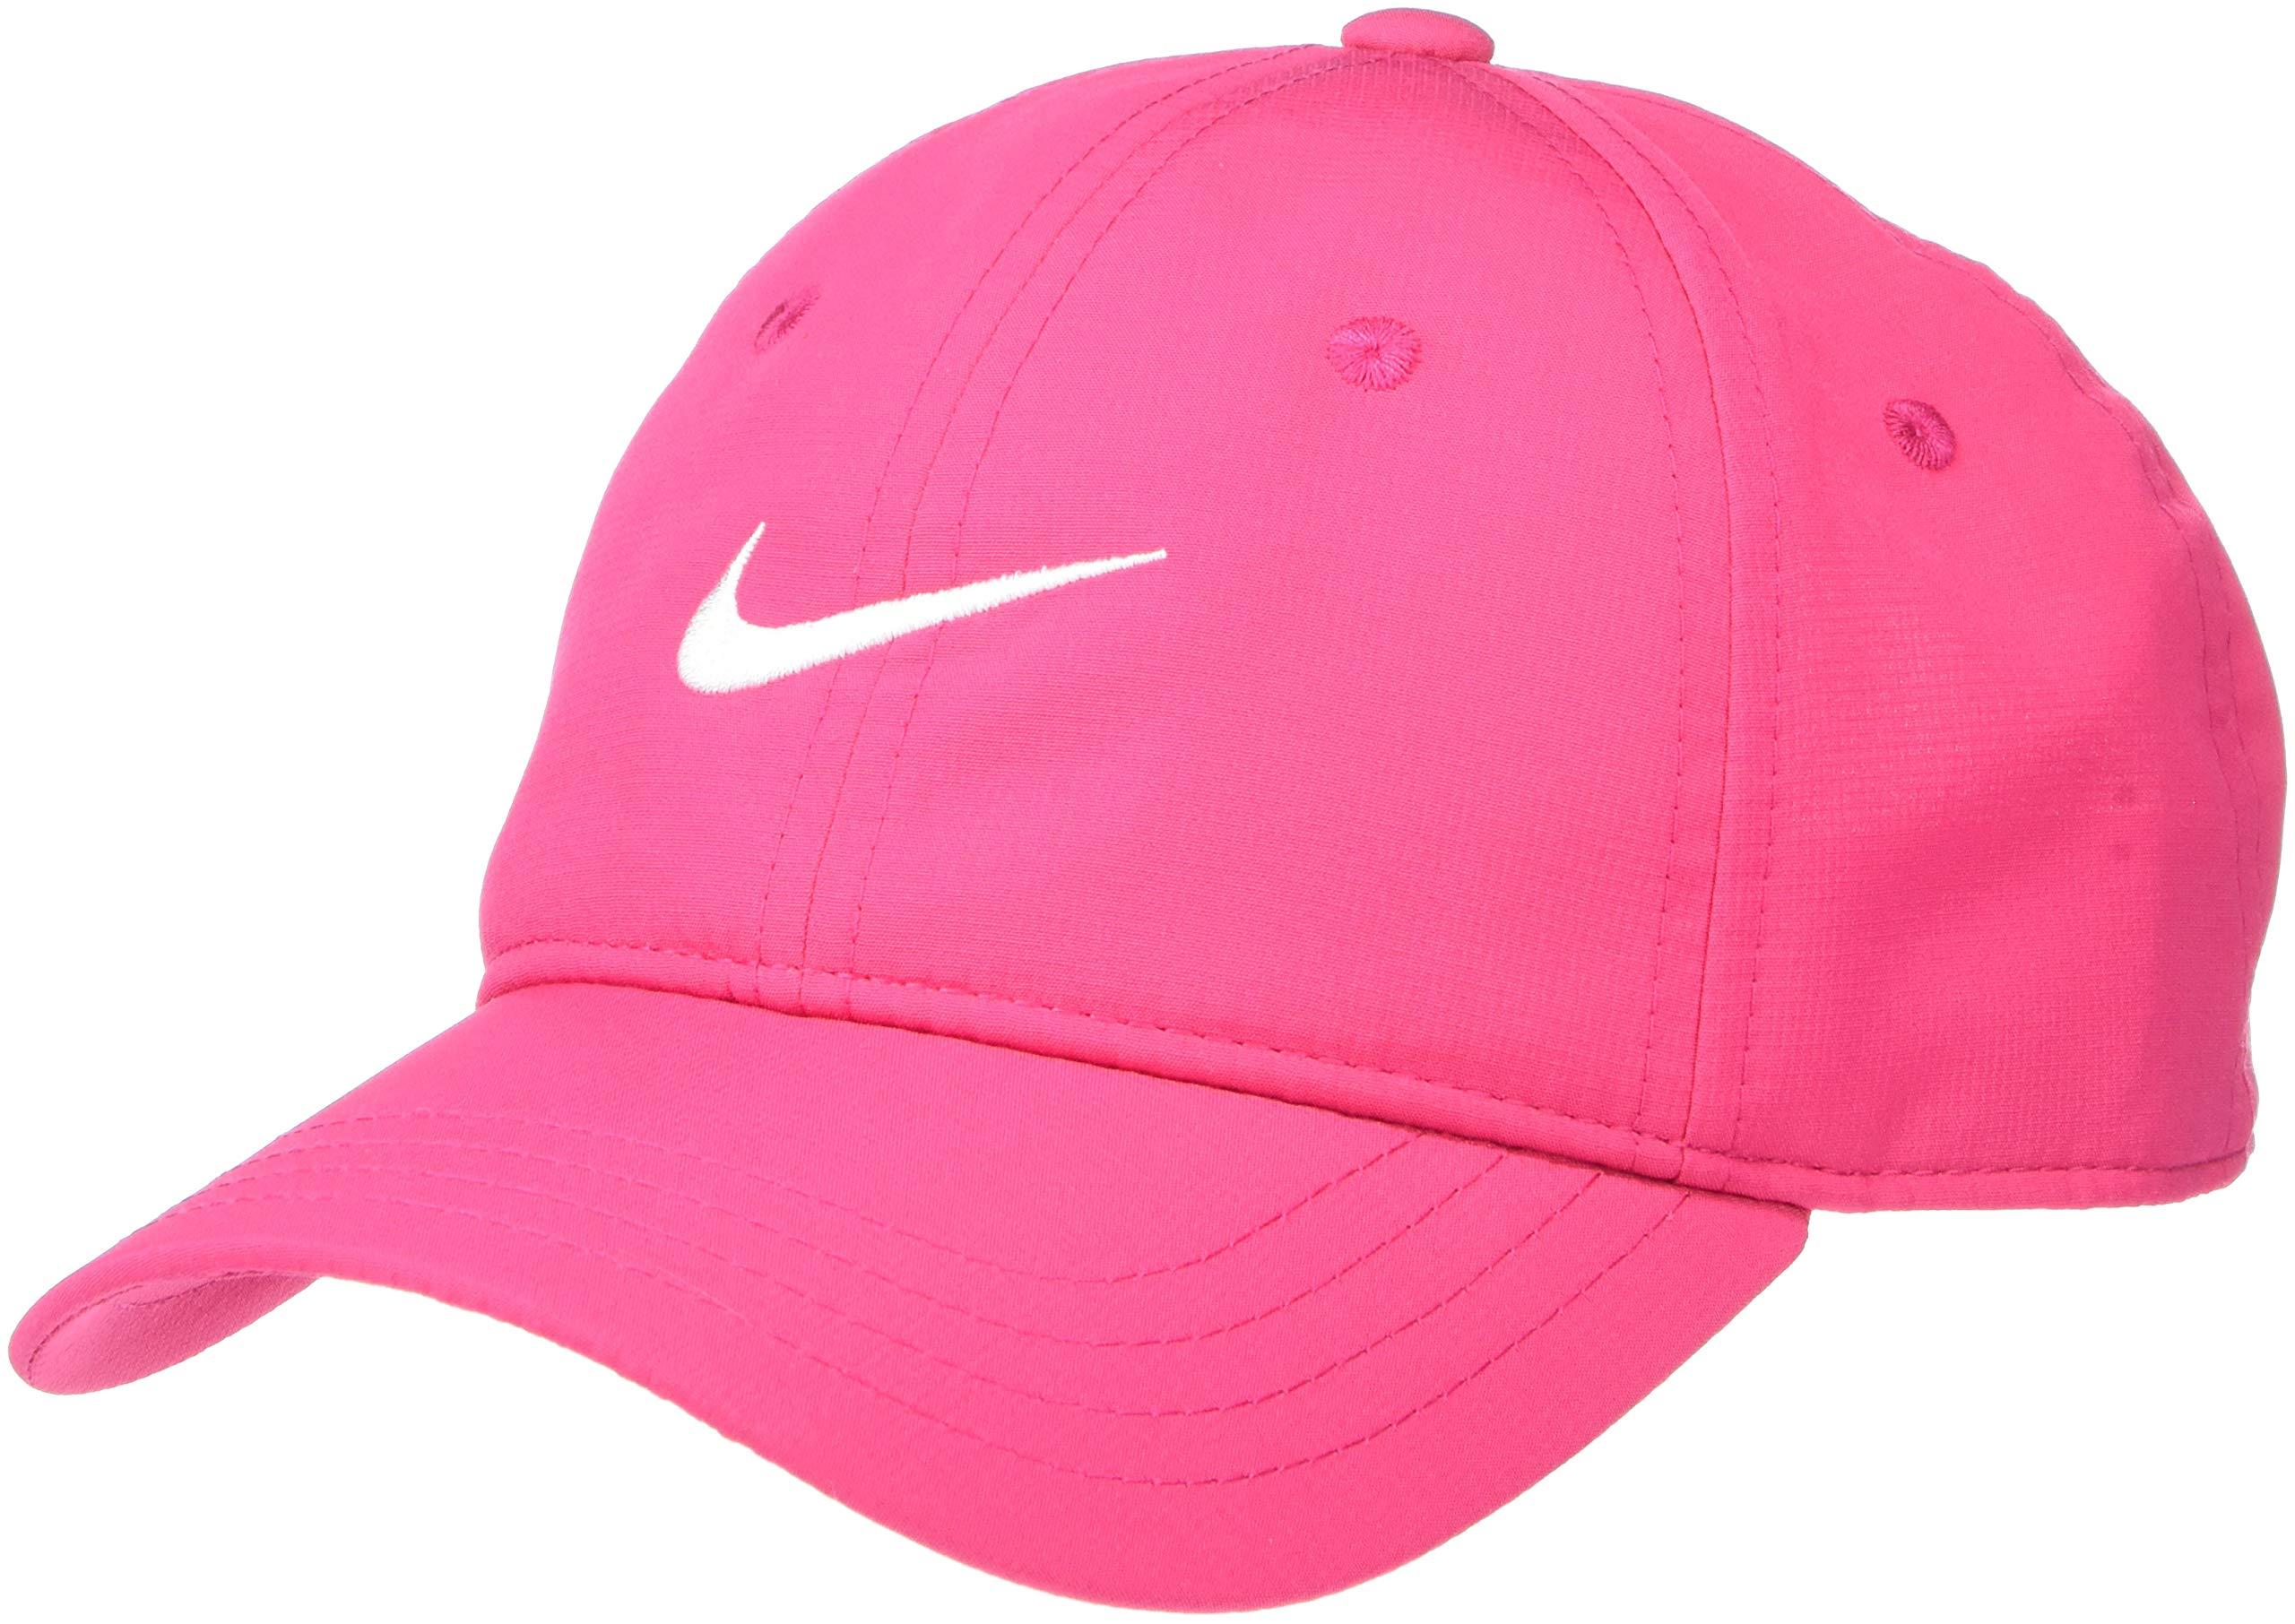 NIKE Children's Apparel Kids' Little Classic Ripstop Basball Hat, Rush Pink, O/S by NIKE Children's Apparel